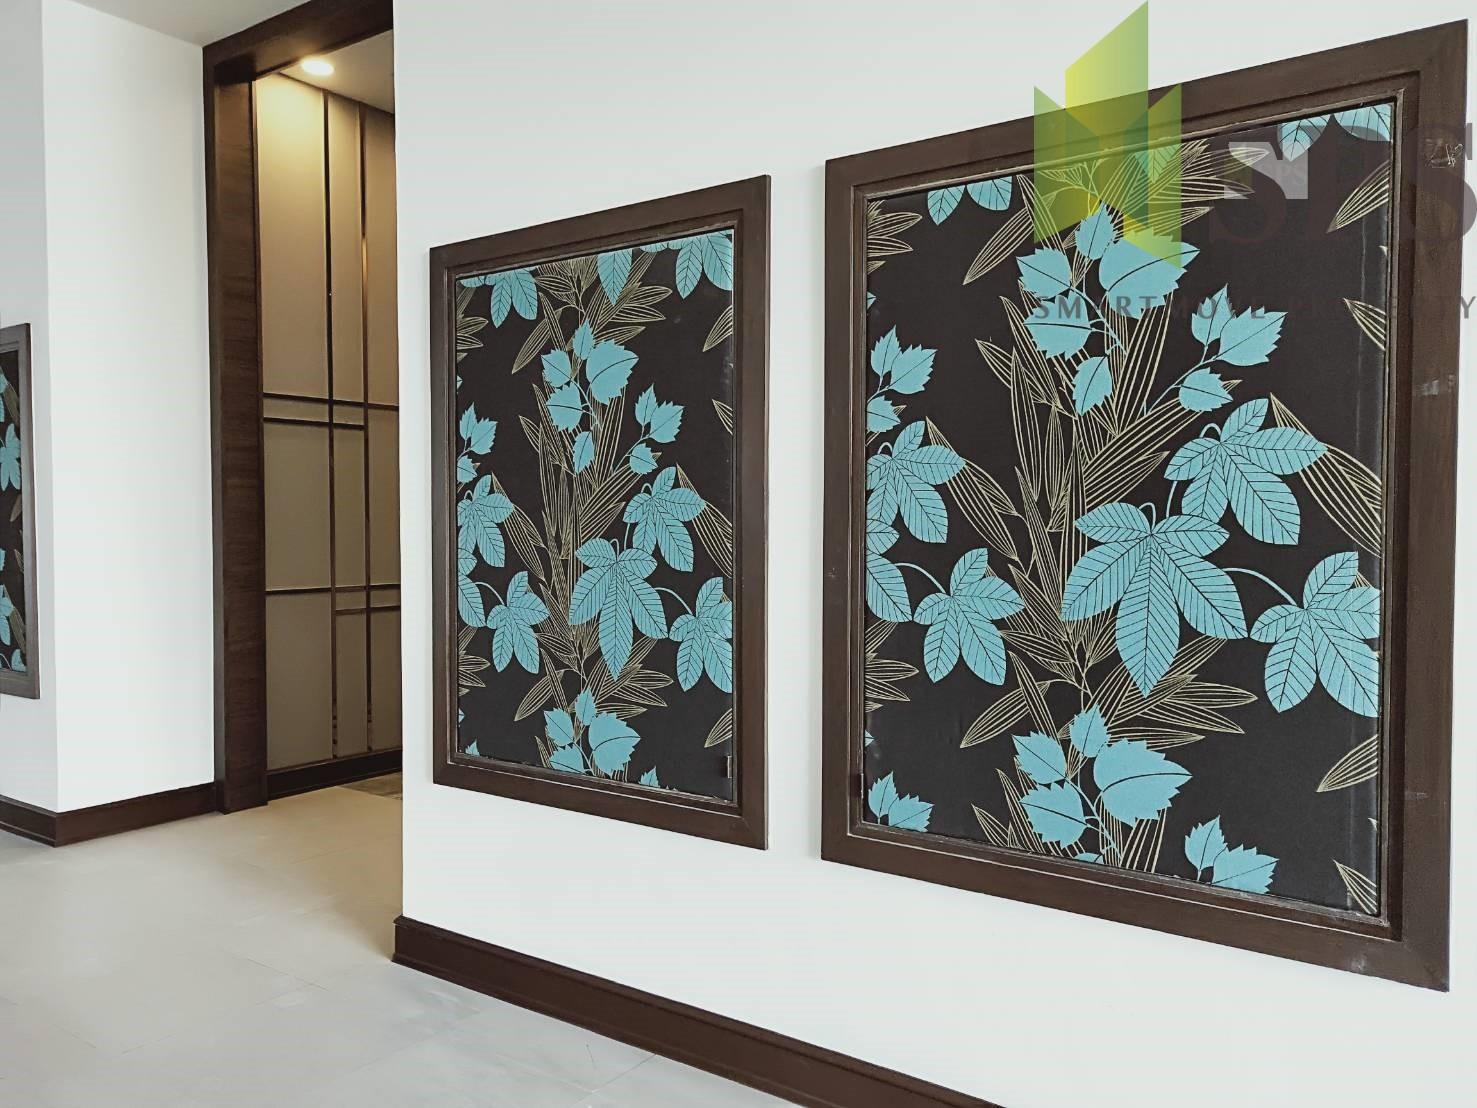 For Rent Condo 1 bed The Metropolis Samrong (SPS-GC198)